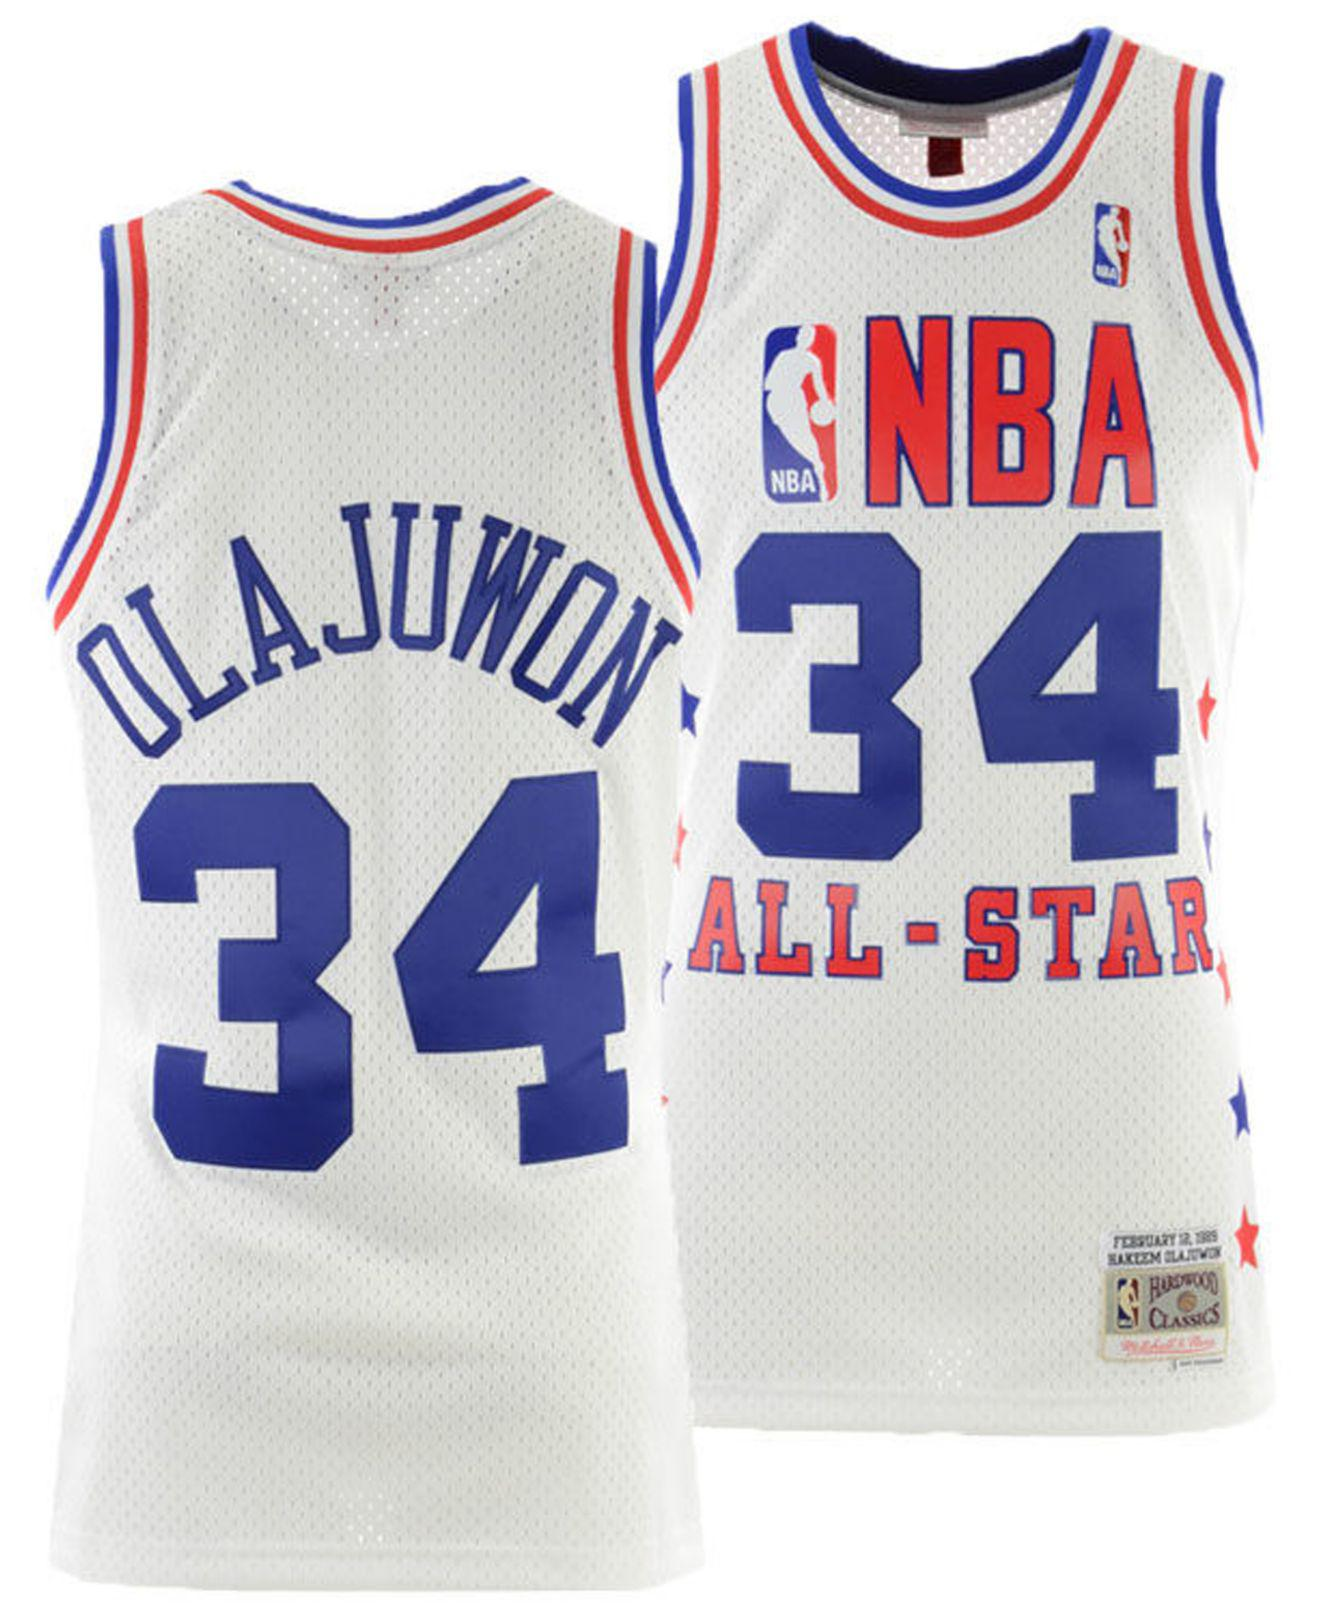 781665173 Mitchell   Ness. Men s Blue Hakeem Olajuwon Nba All Star 1989 Swingman  Jersey